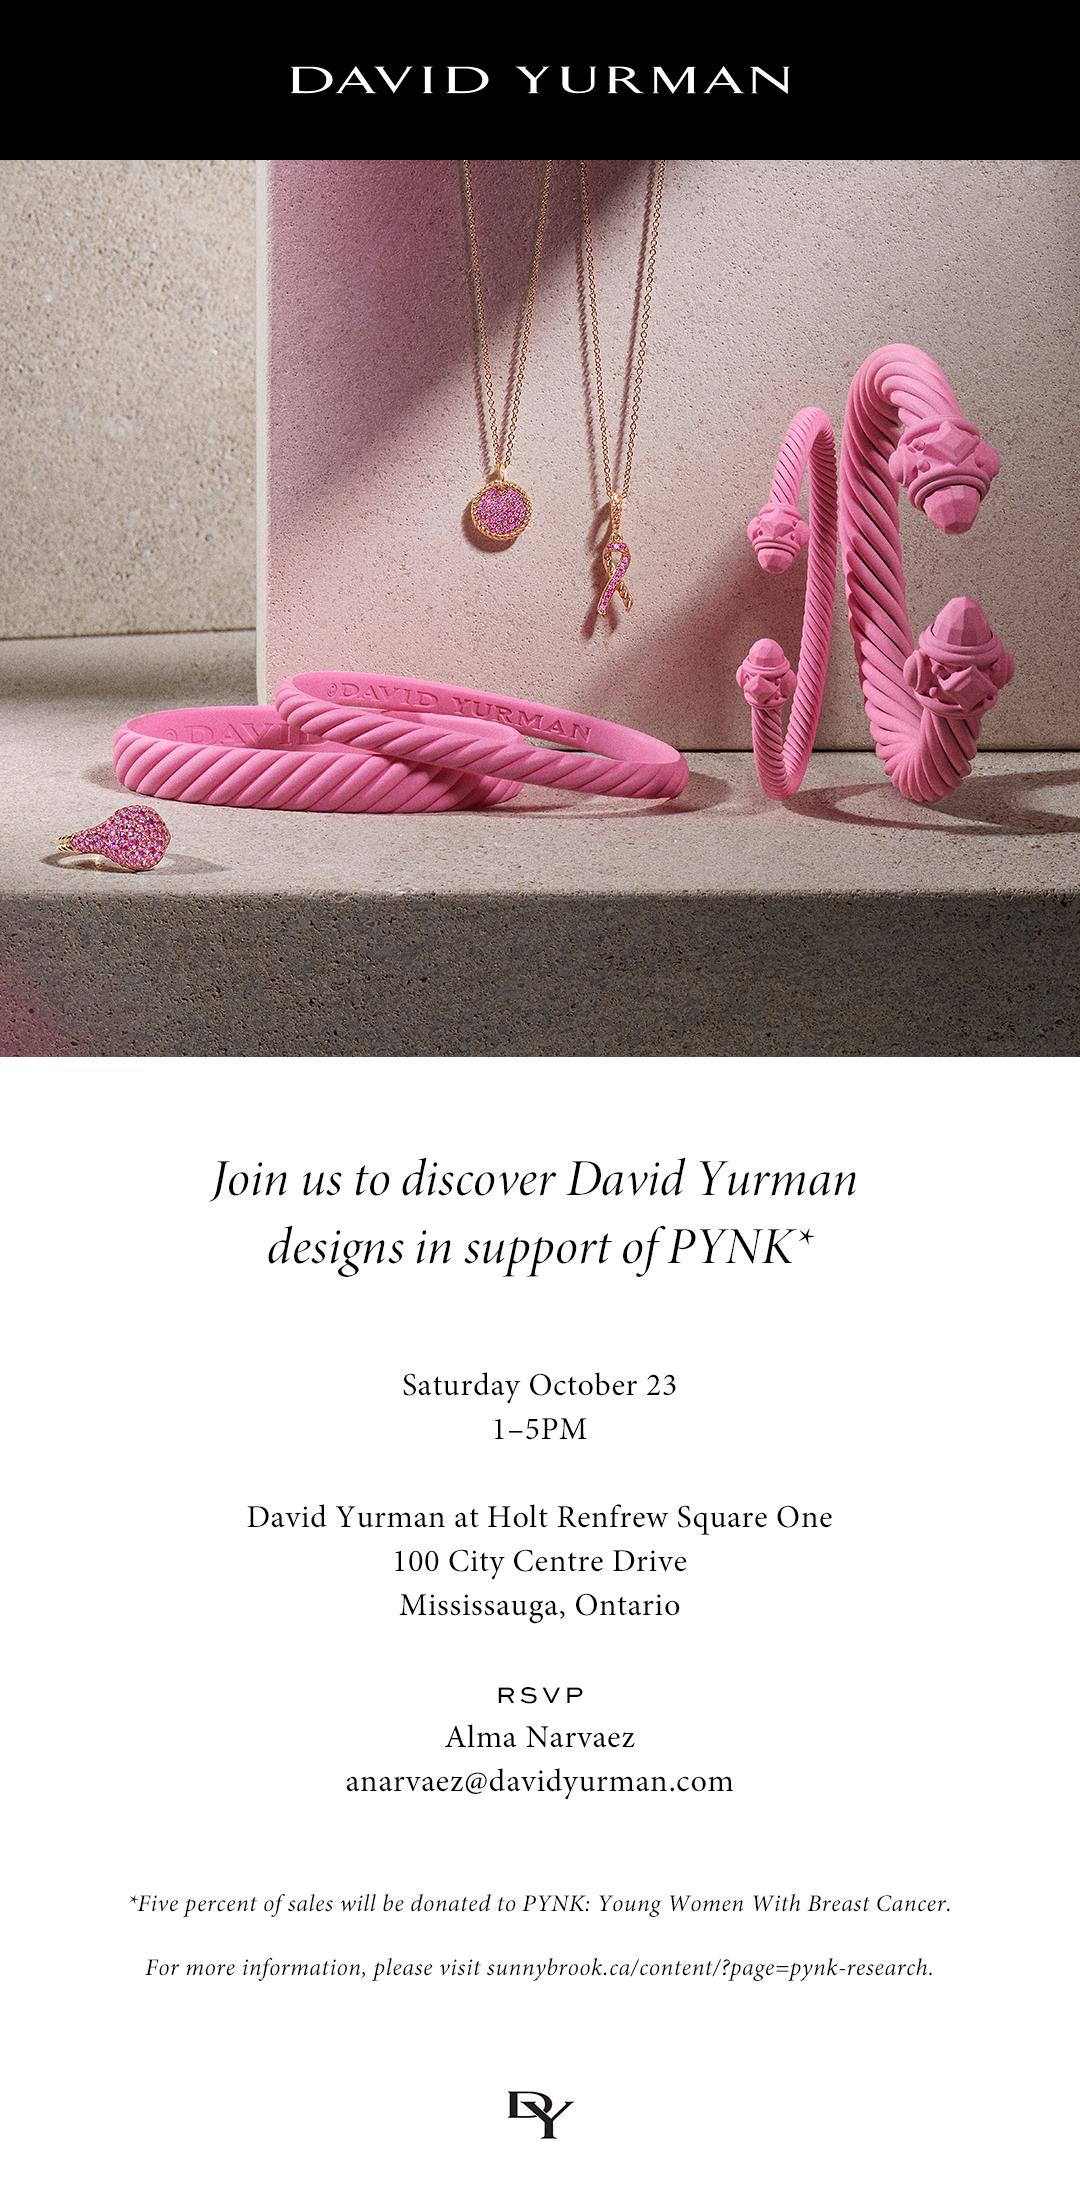 David Yurman Event